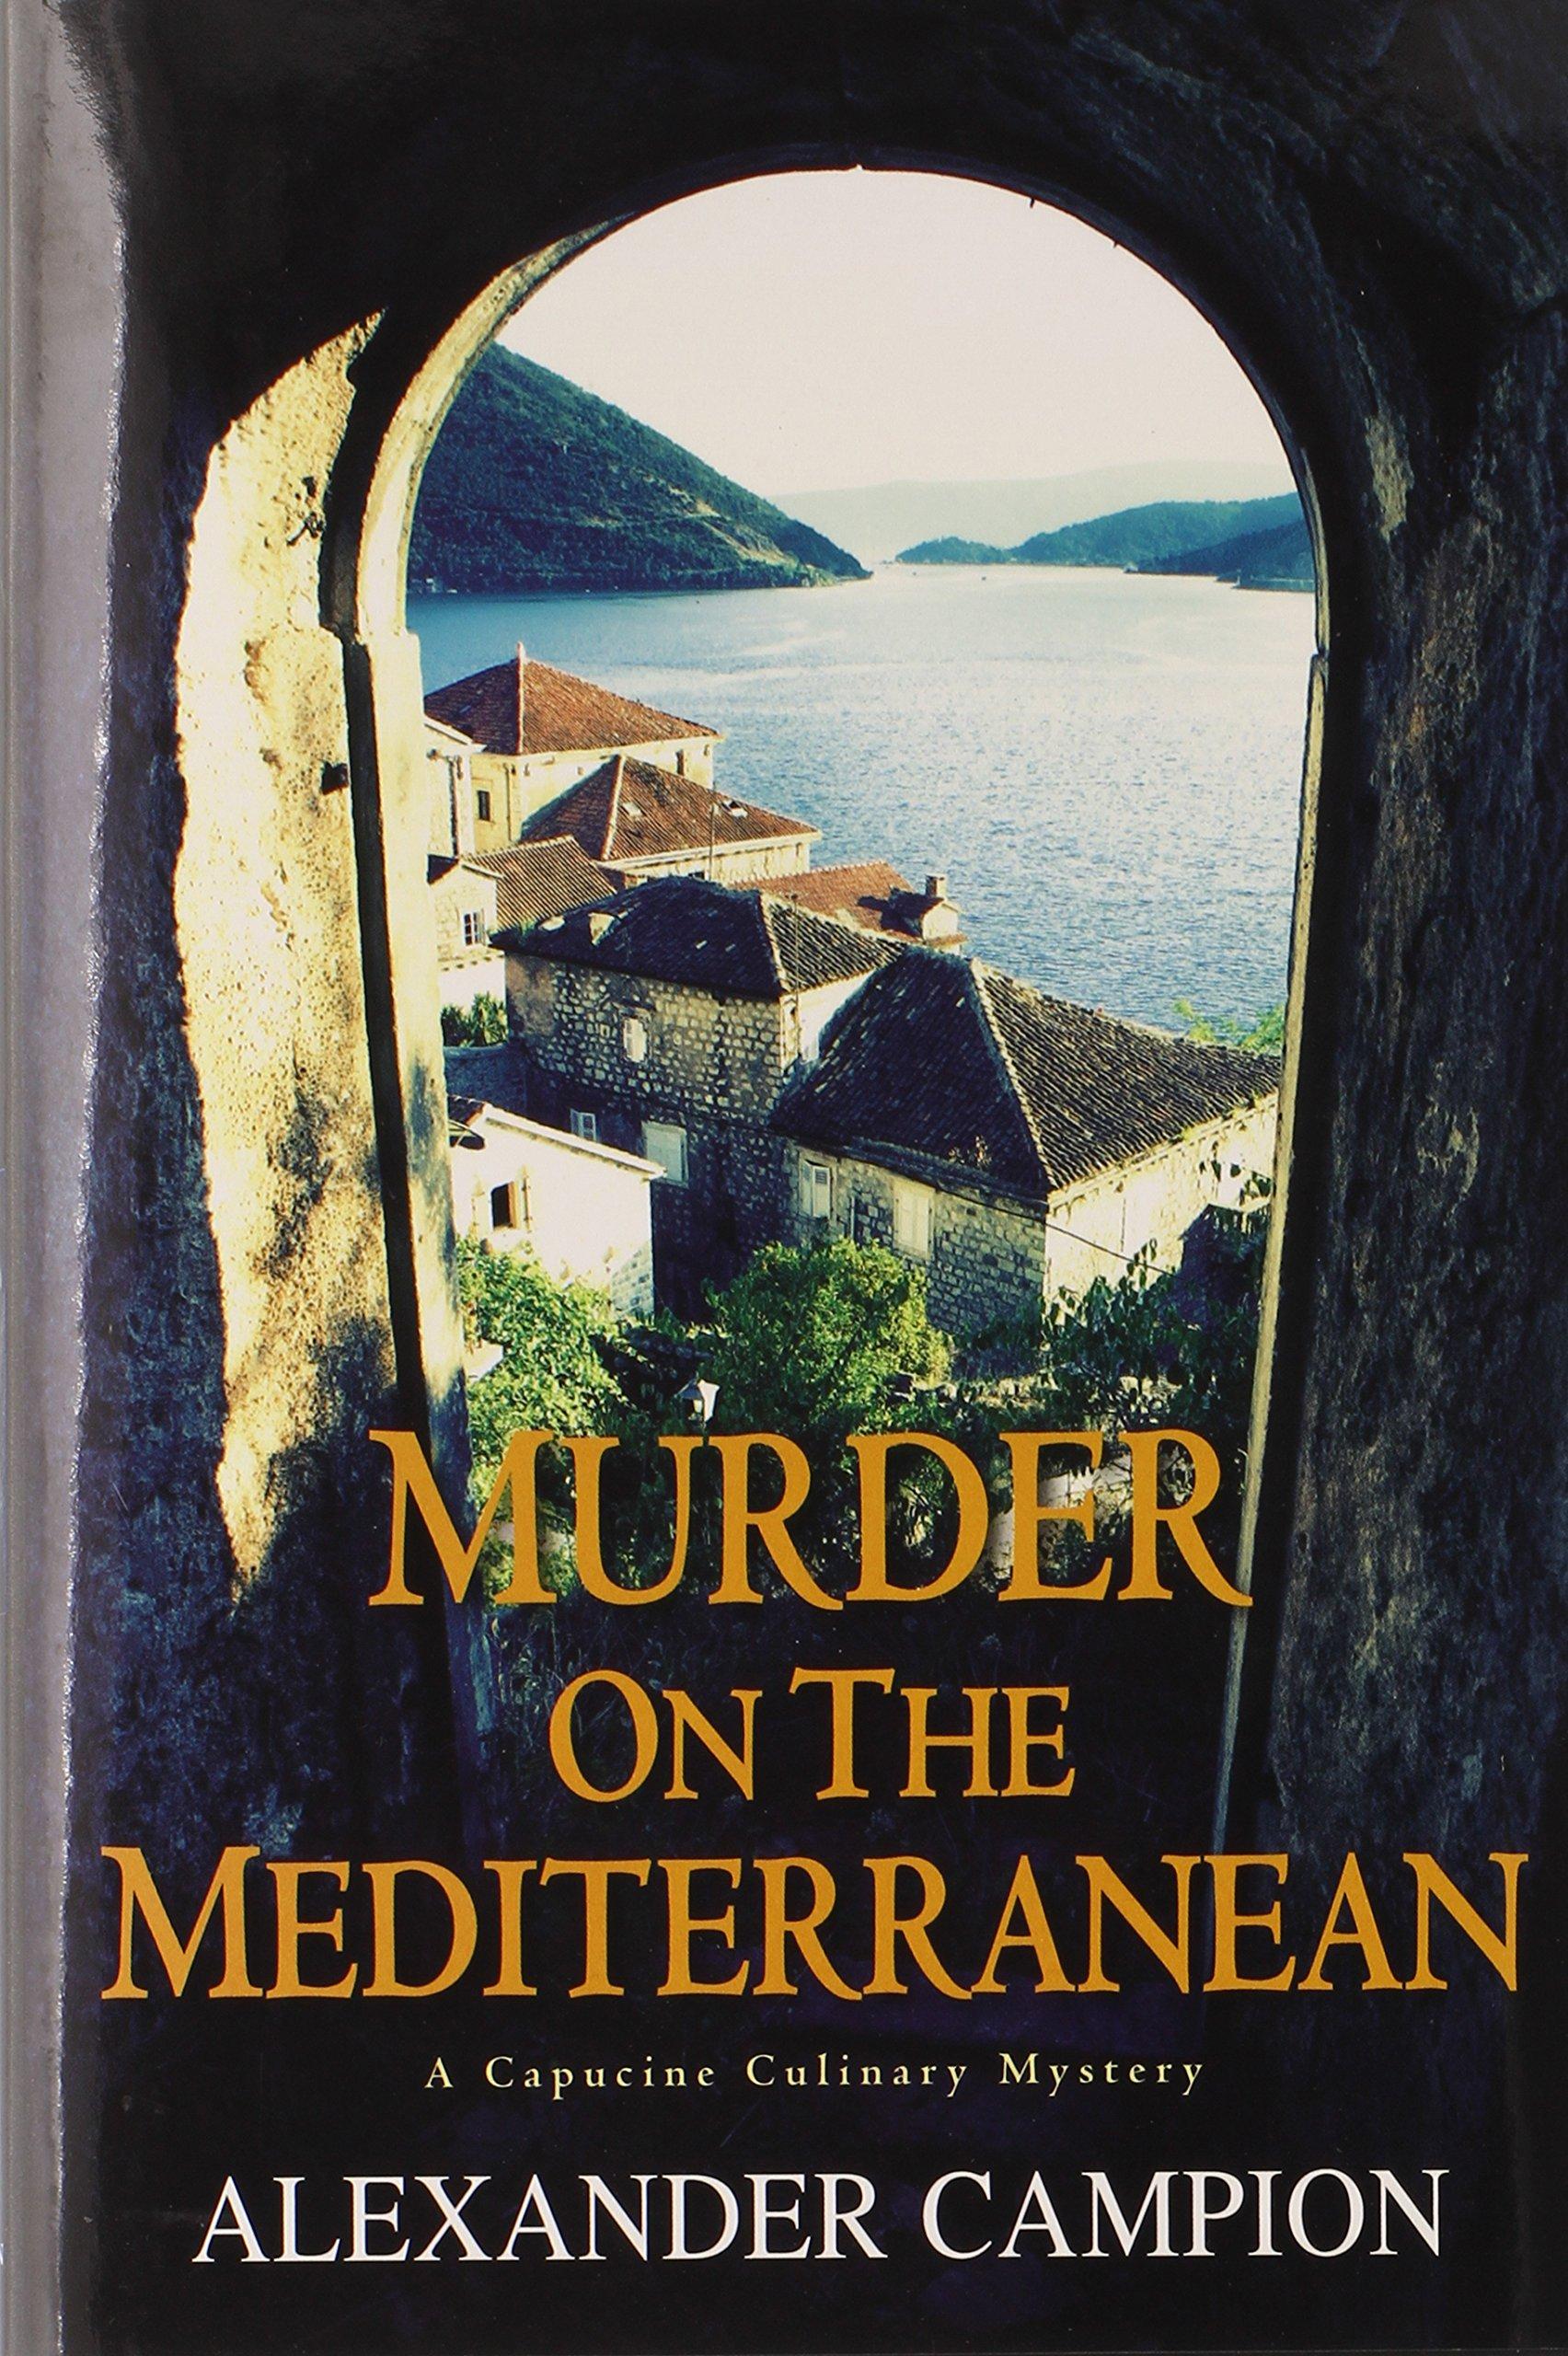 Murder on the Mediterranean (Capucine Culinary Mystery) ebook